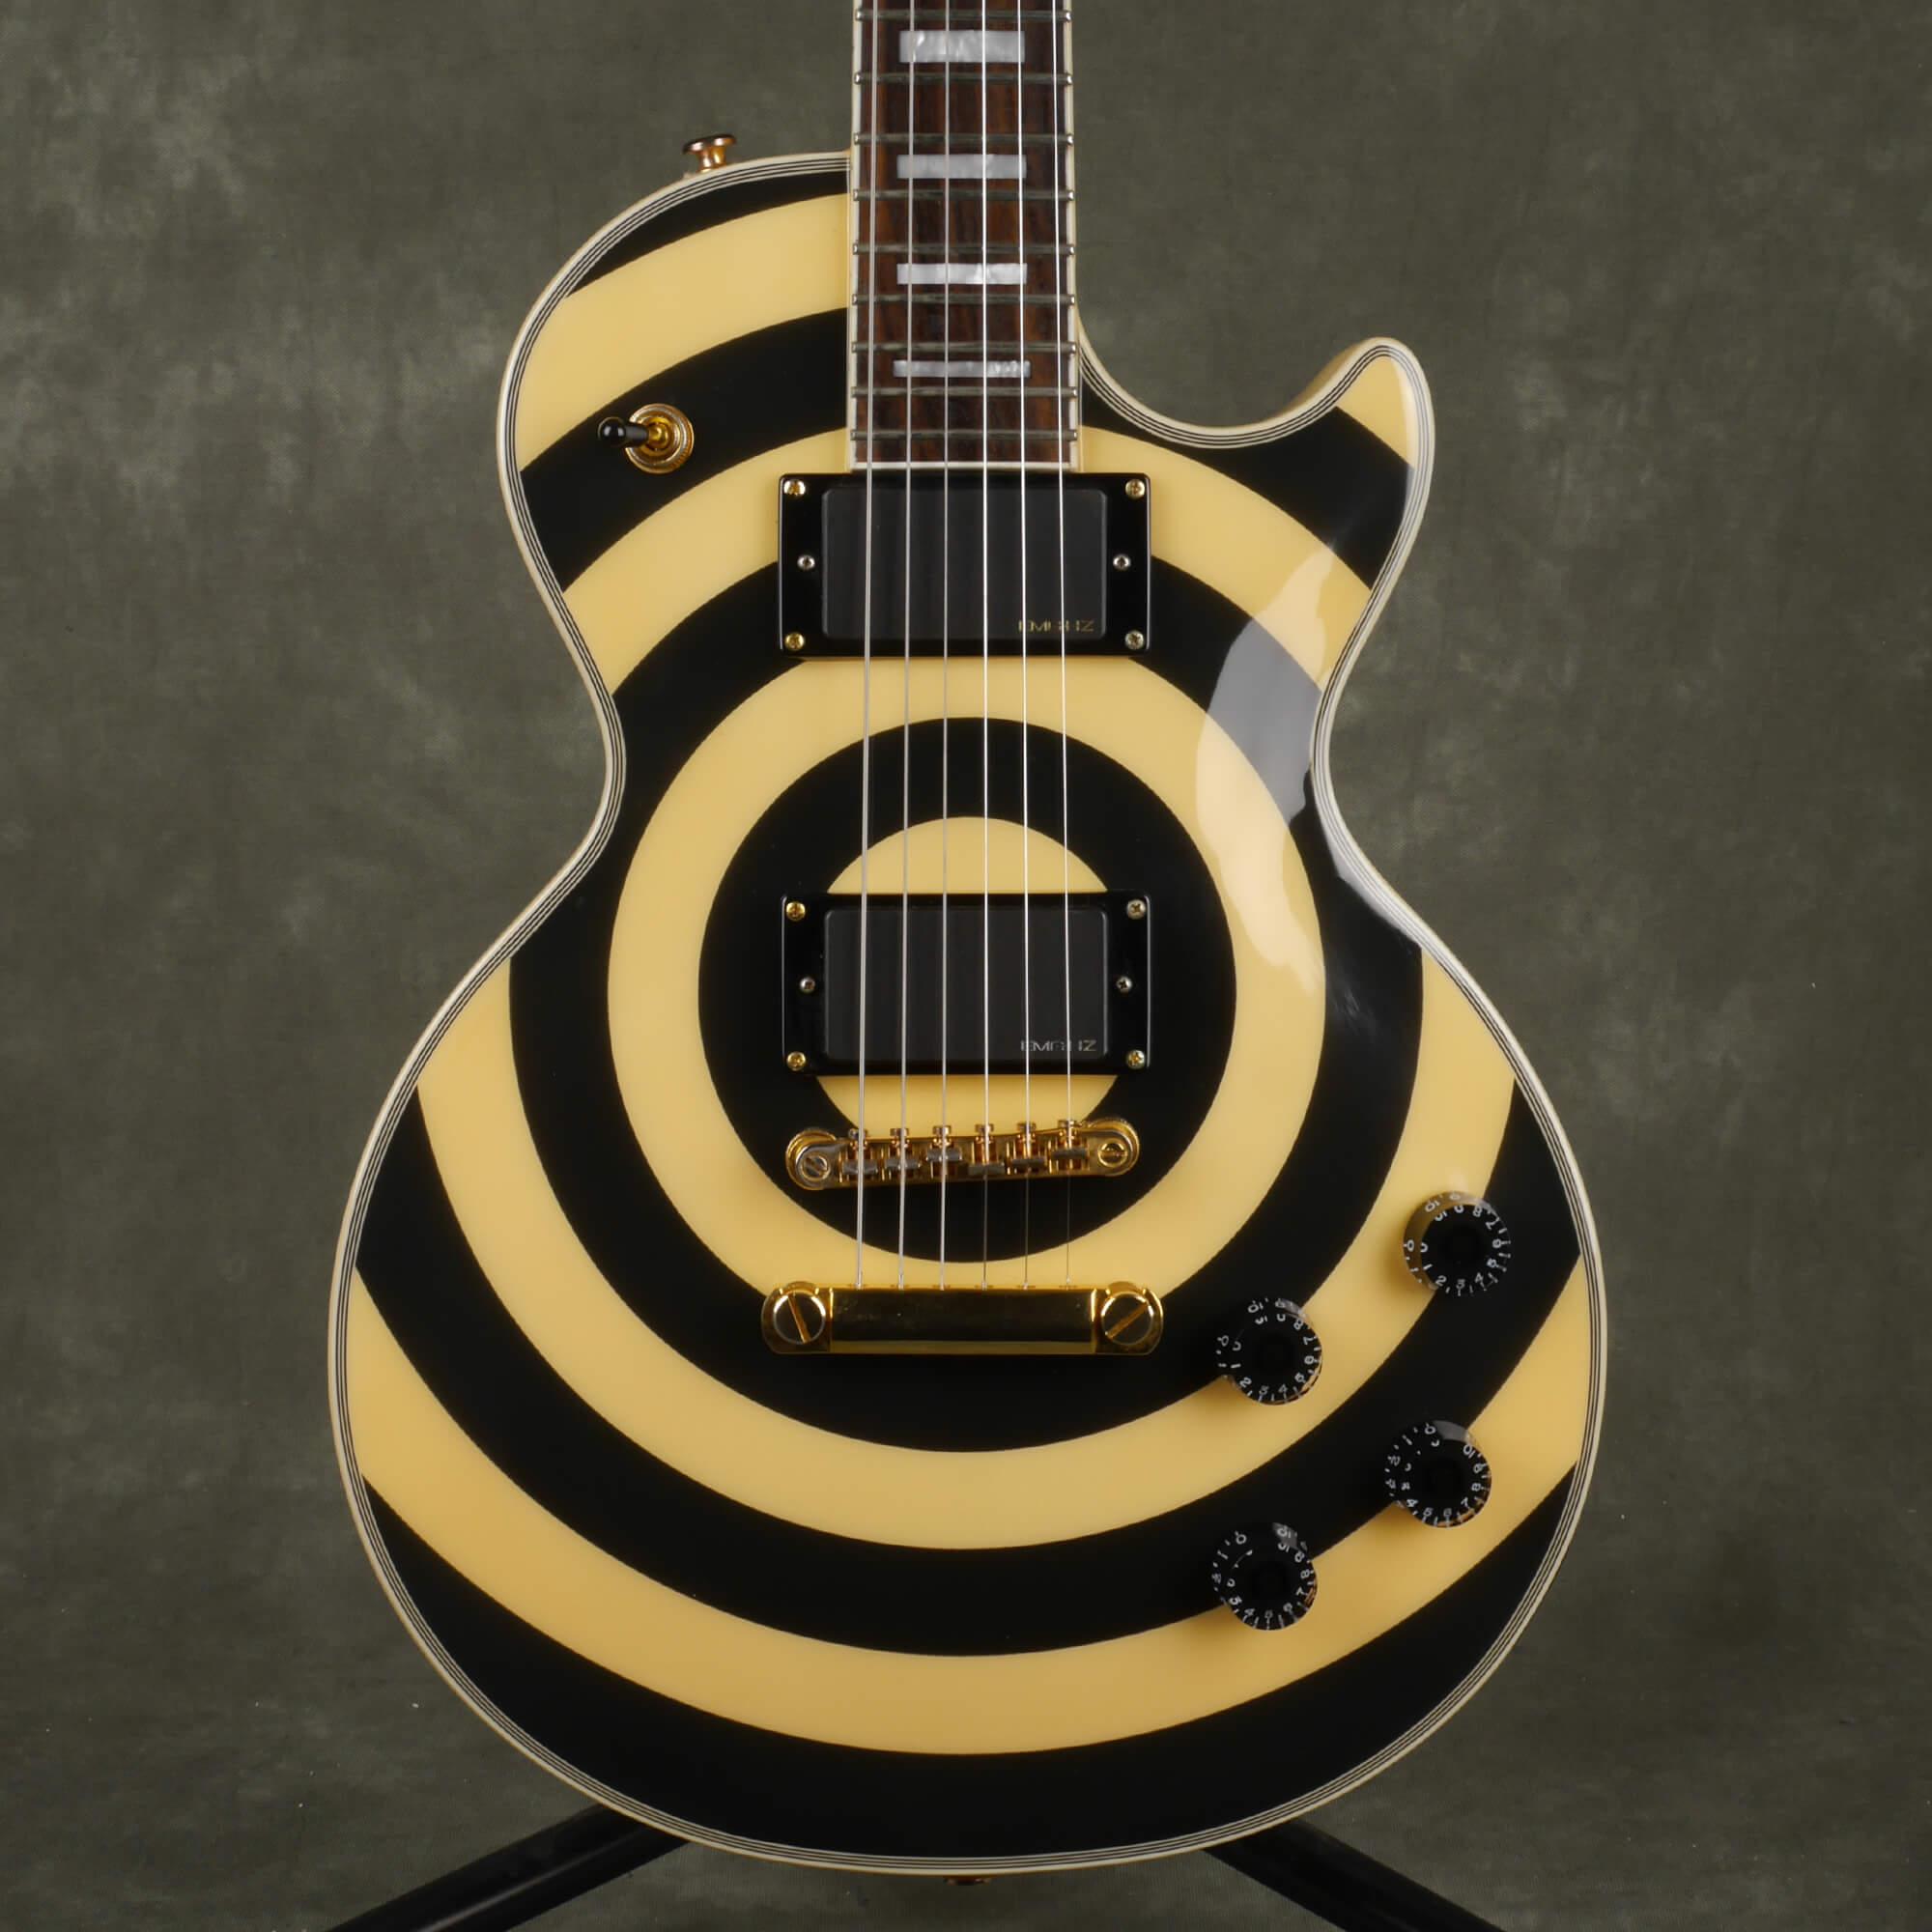 Epiphone Les Paul Zakk Wylde Bullseye Electric Guitar - 2nd Hand